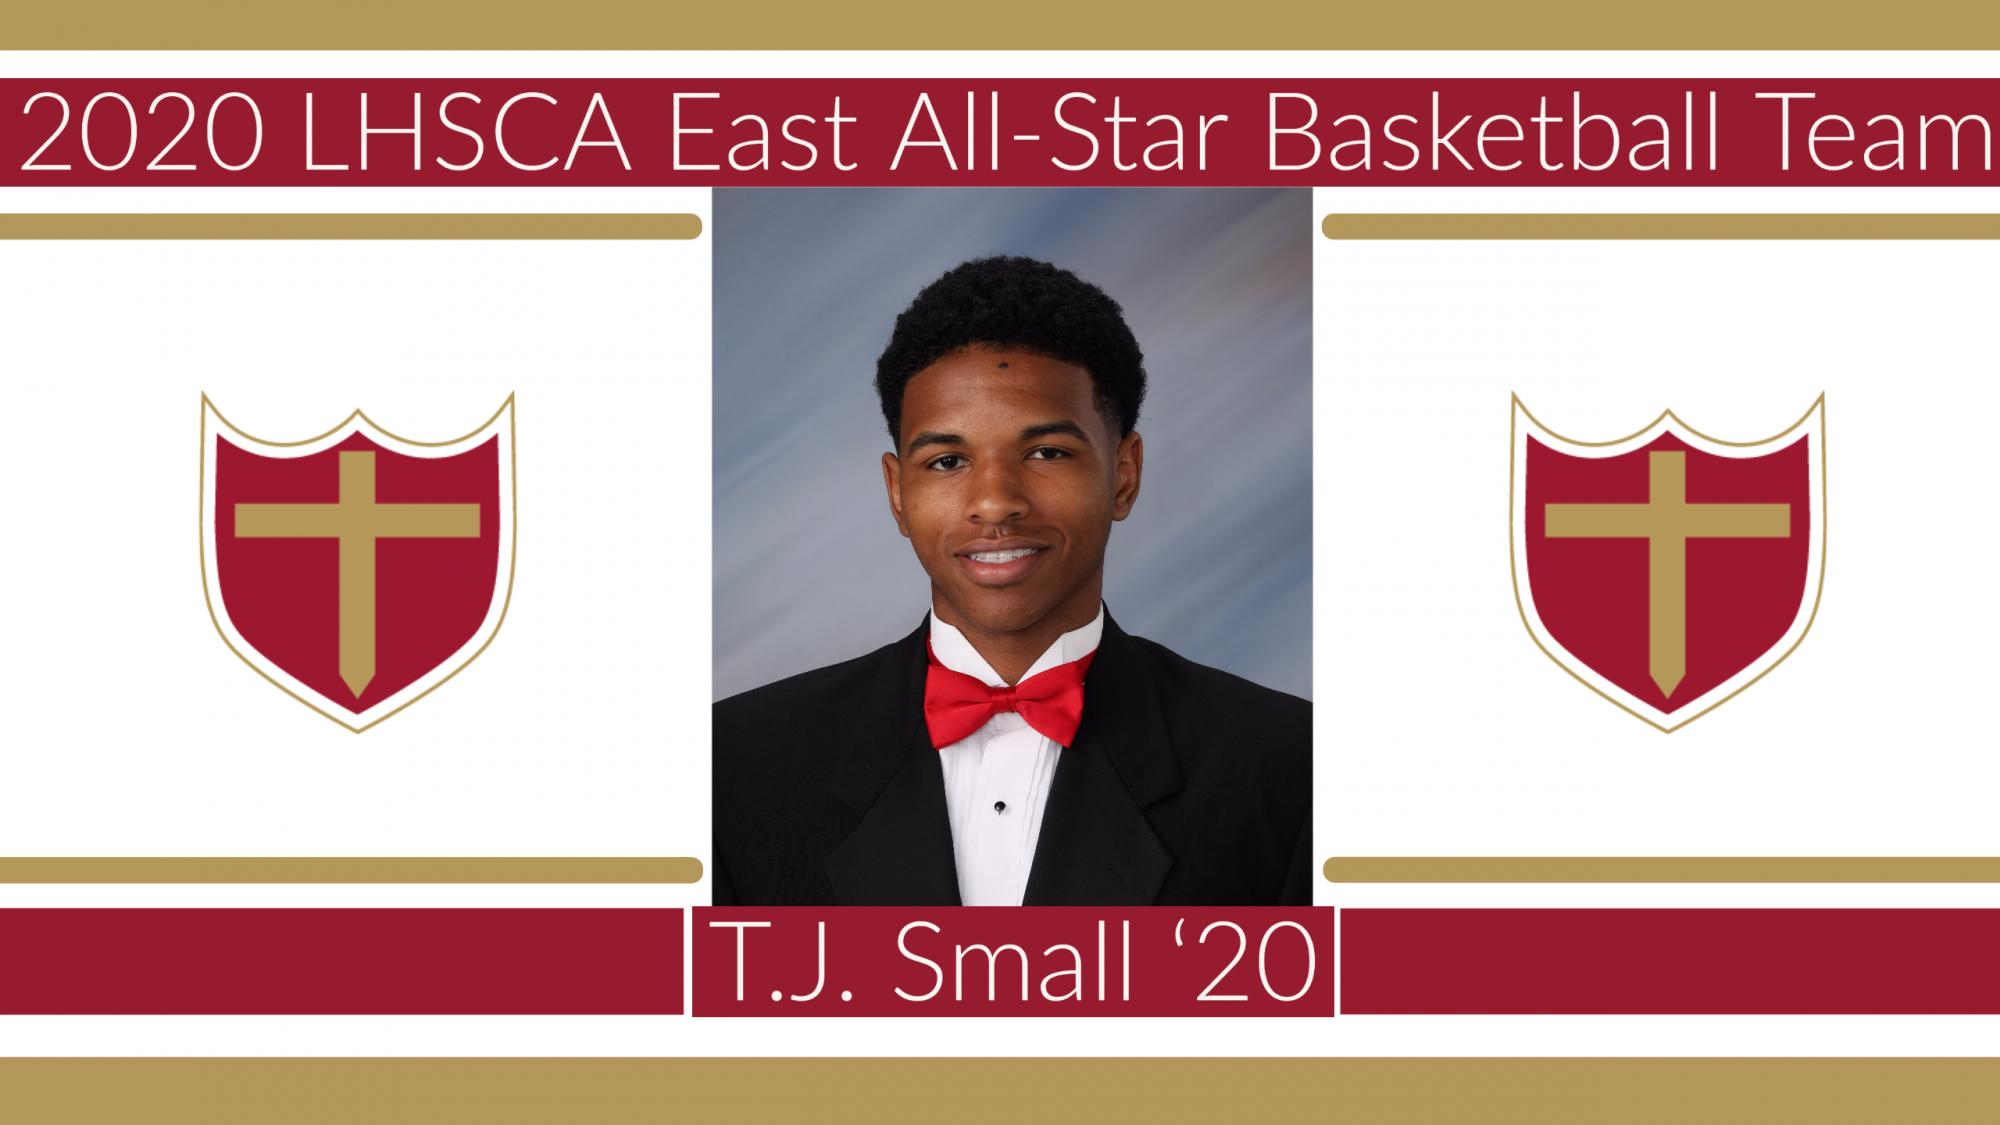 TJ Small '20 - East All-Star Team